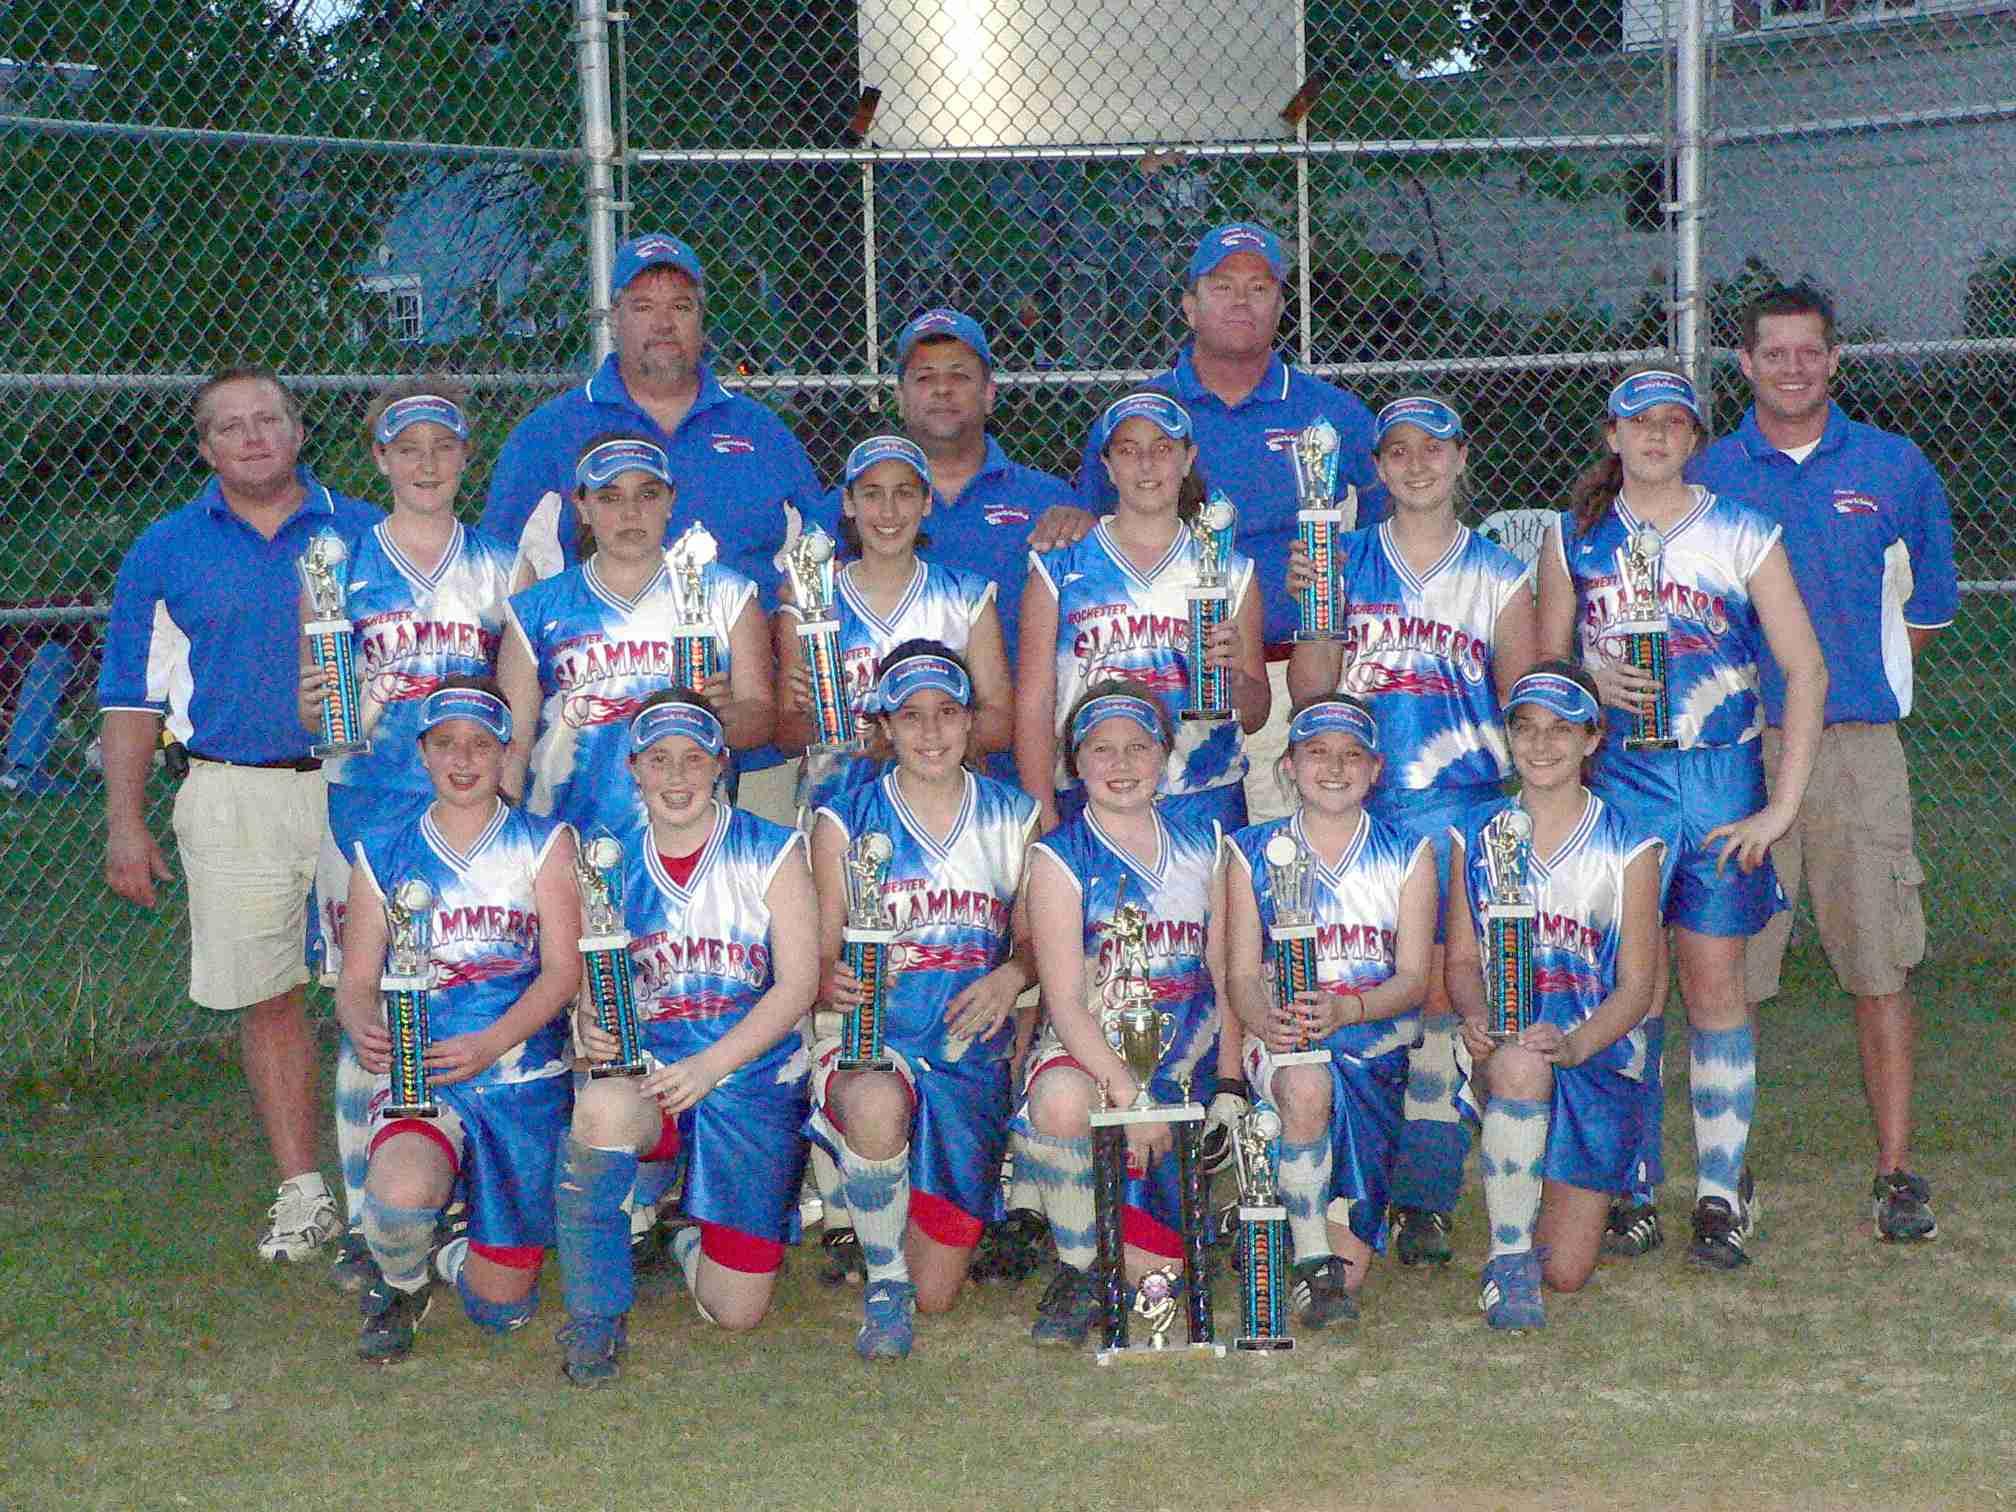 2006 Lowell Invitational Champions